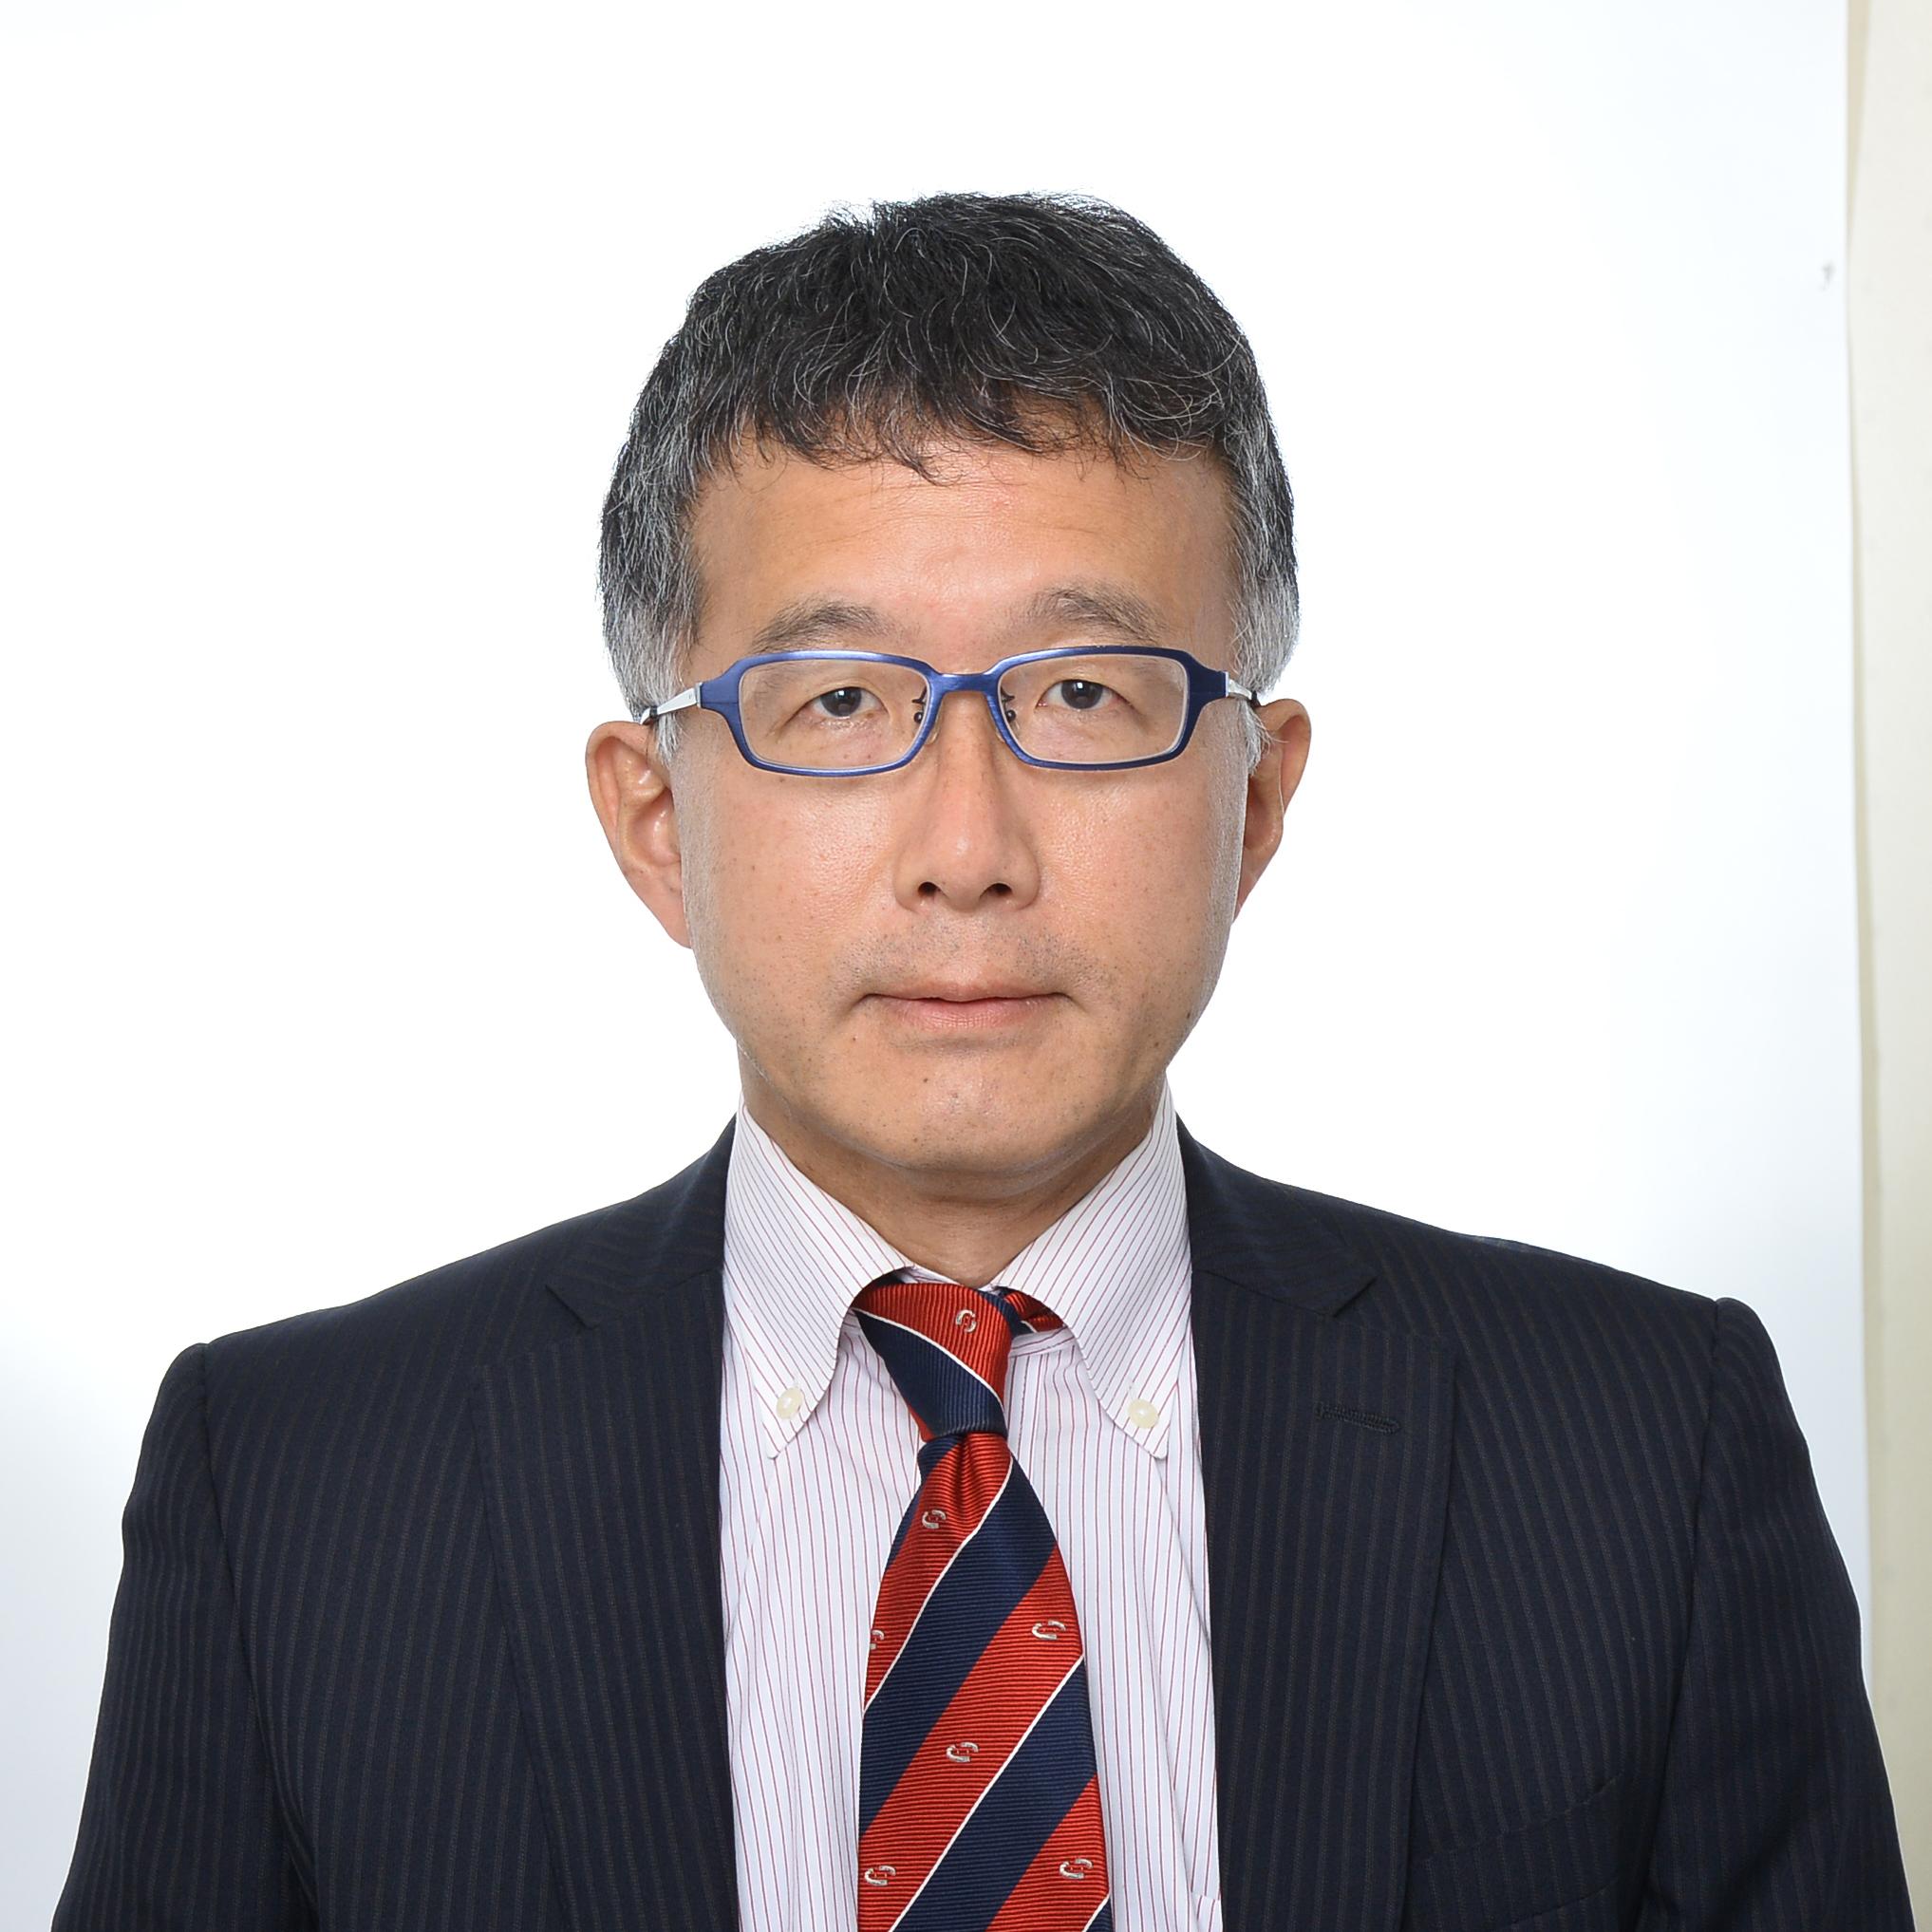 https://industrial-transformation.com/storage/uploads/Speakers/ITF_Speakers/ITF_Toru%20Sasaki.png